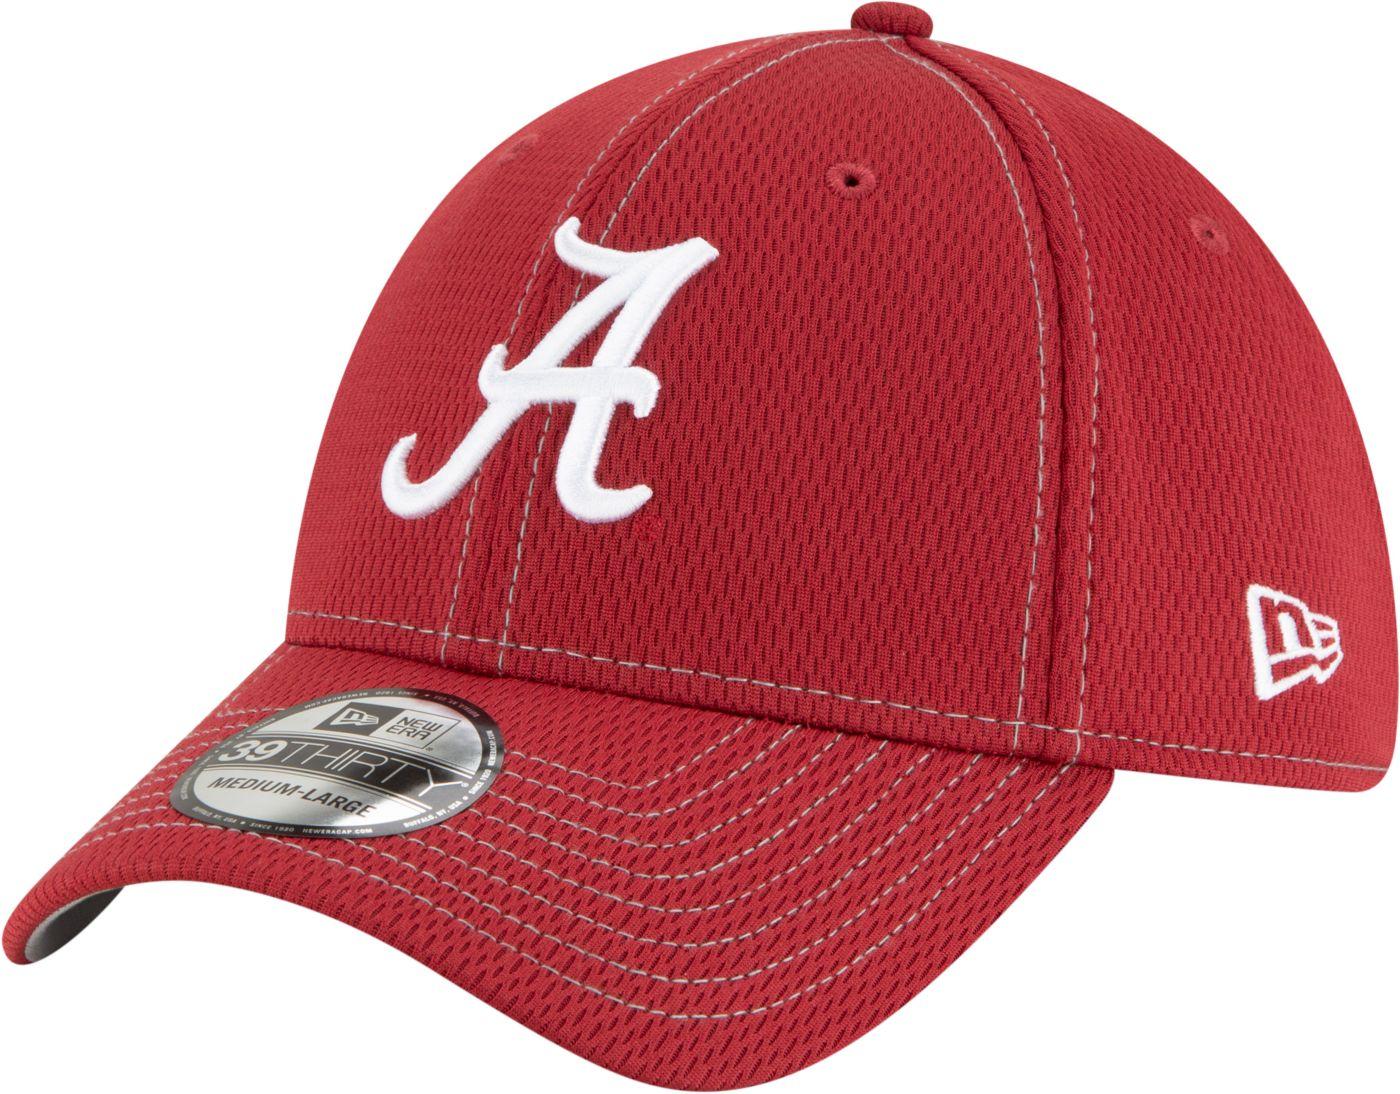 New Era Men's Alabama Crimson Tide Crimson Sideline Road 39Thirty Stretch Fit Hat